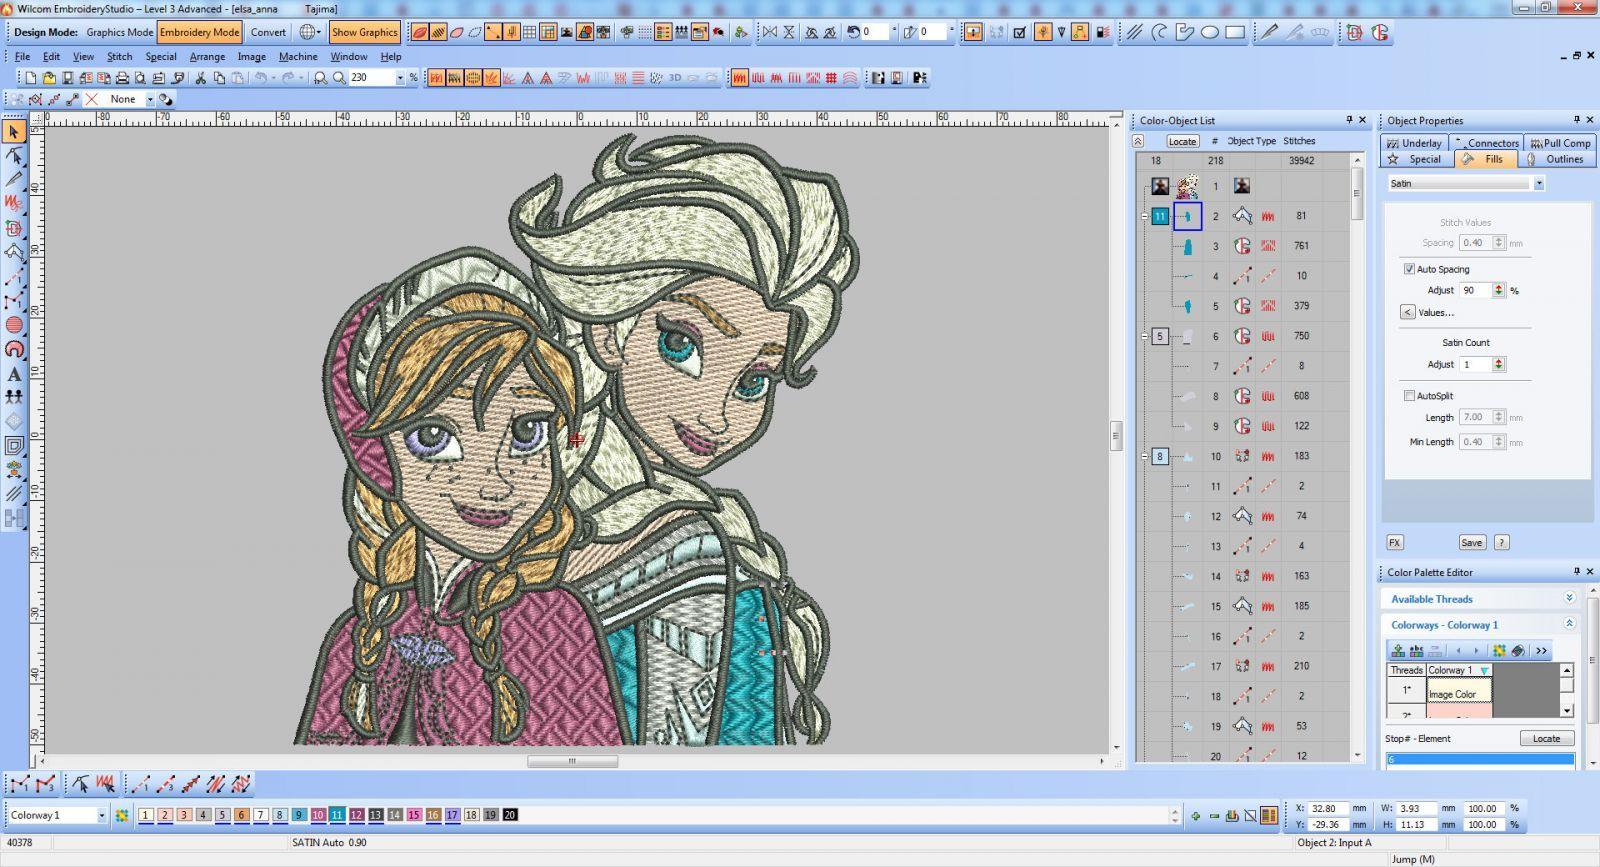 Frozen sisters embroidery design screenshot in Wilcom